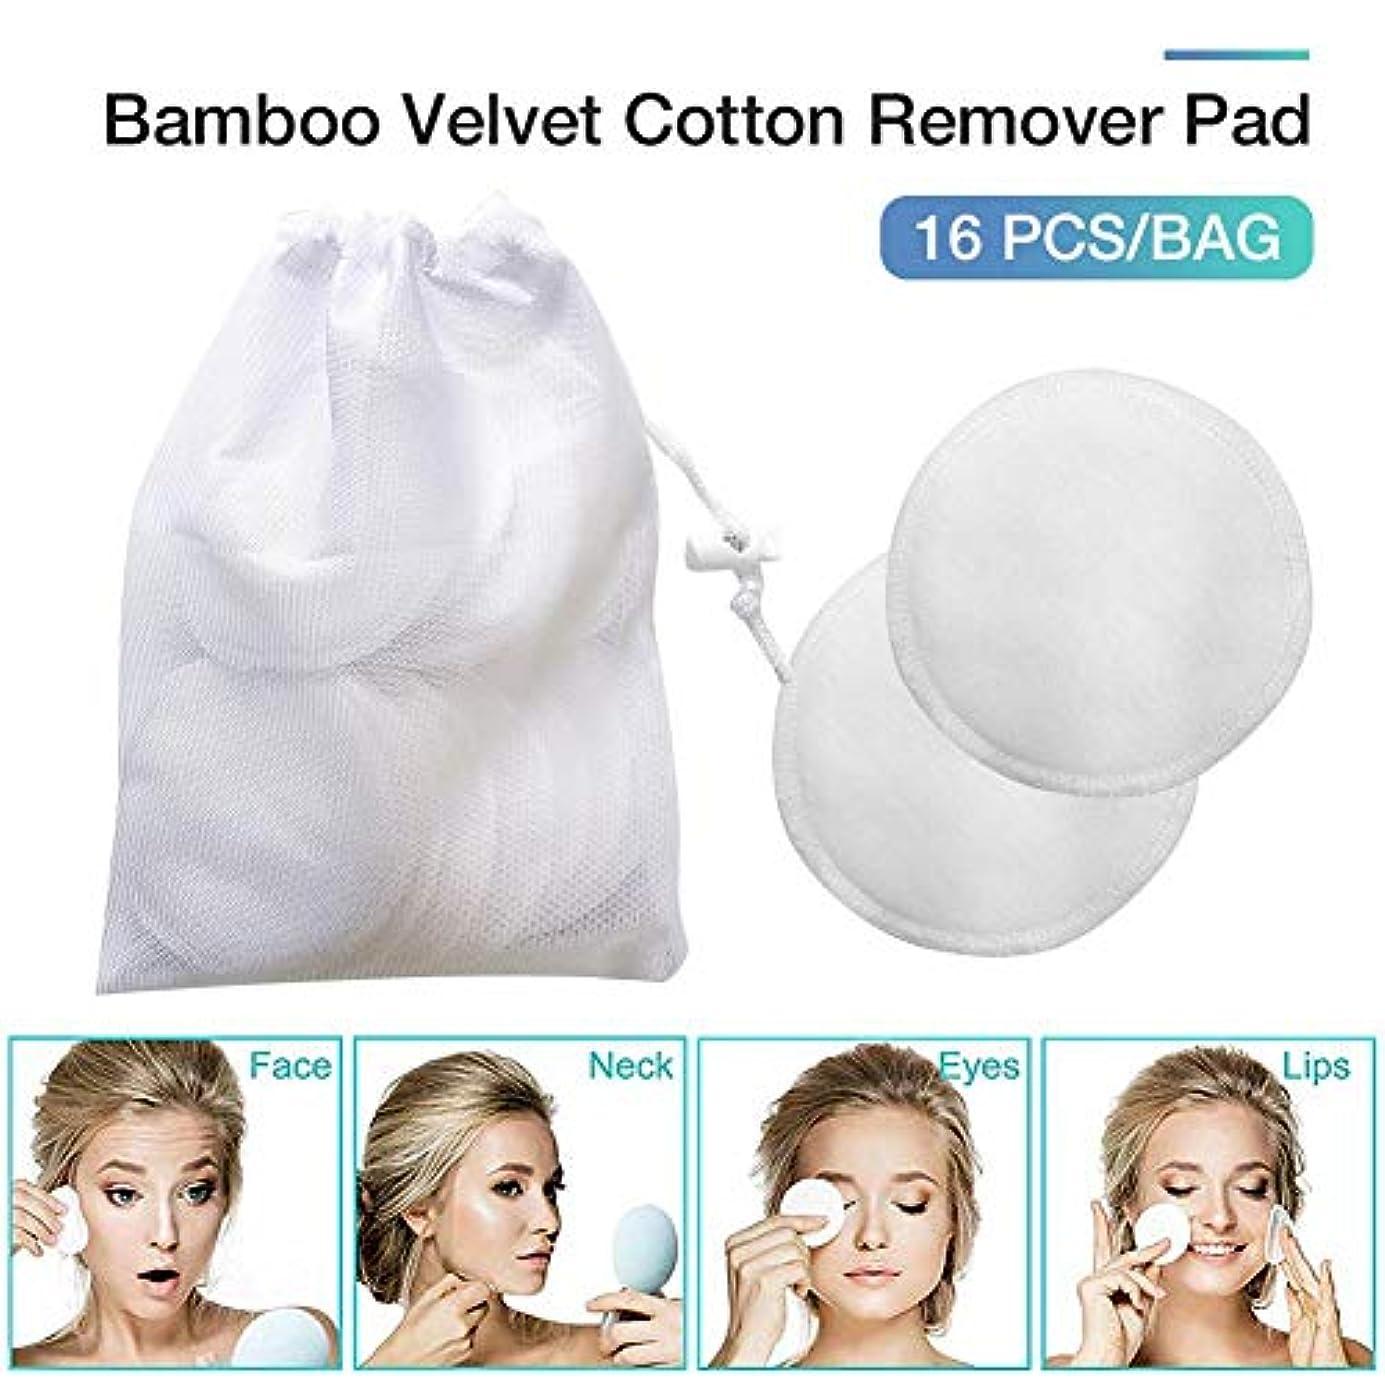 Ming-Dian クレンジングパッド、綿のクリーニングパッド再利用可能なメッシュランドリーバッグすべての肌タイプのフェイシャルクレンジング男性と女性